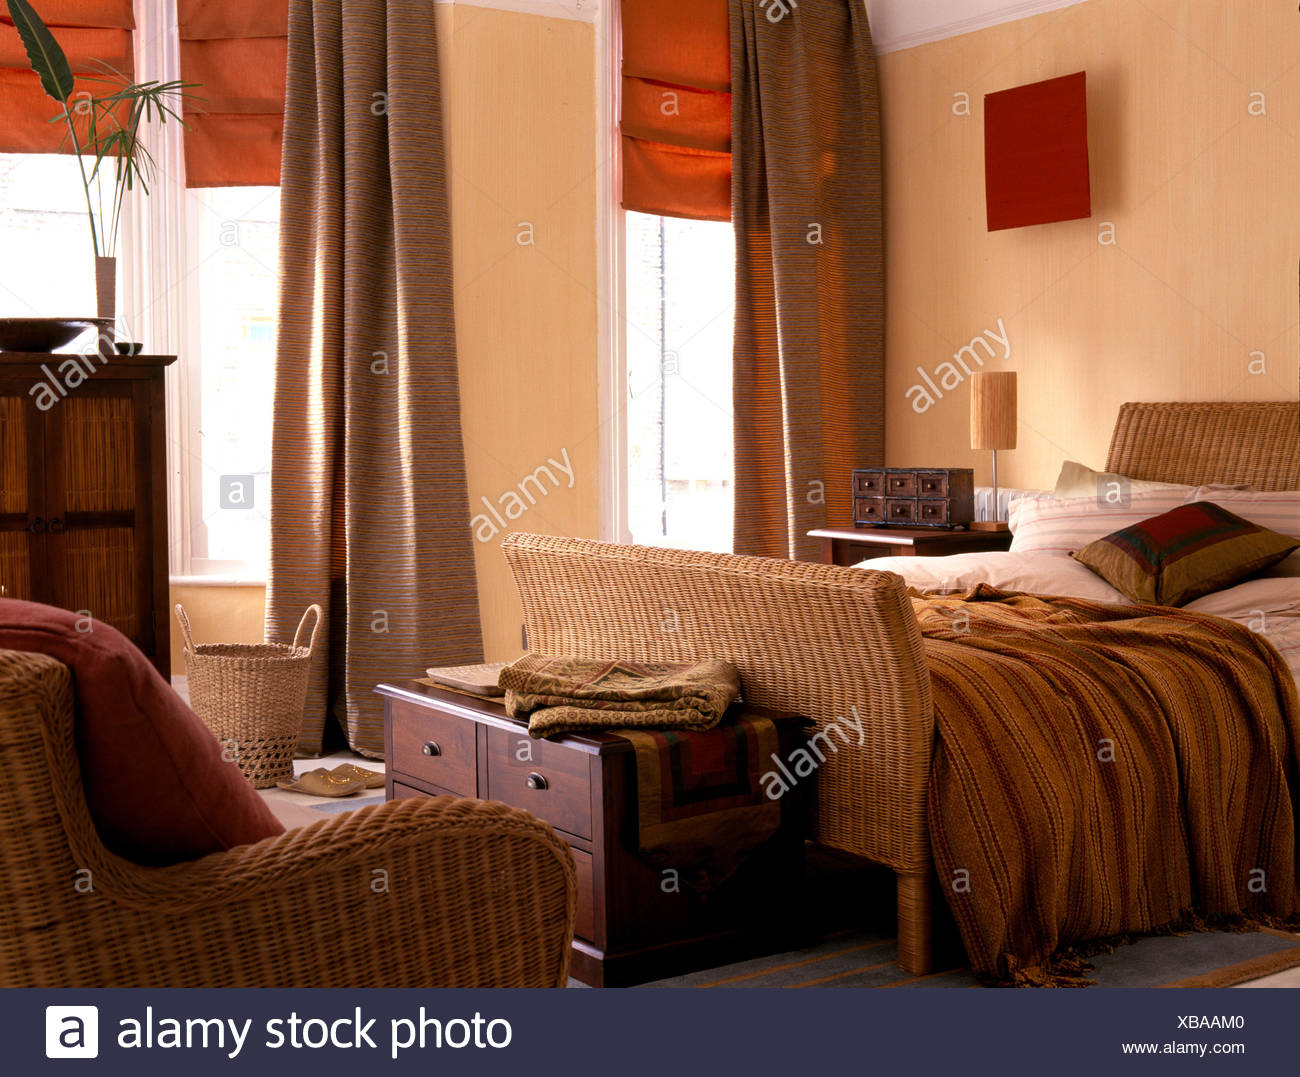 the semi n drapes opaque kenya panel b curtain curtains w home x window brown treatments achim depot in